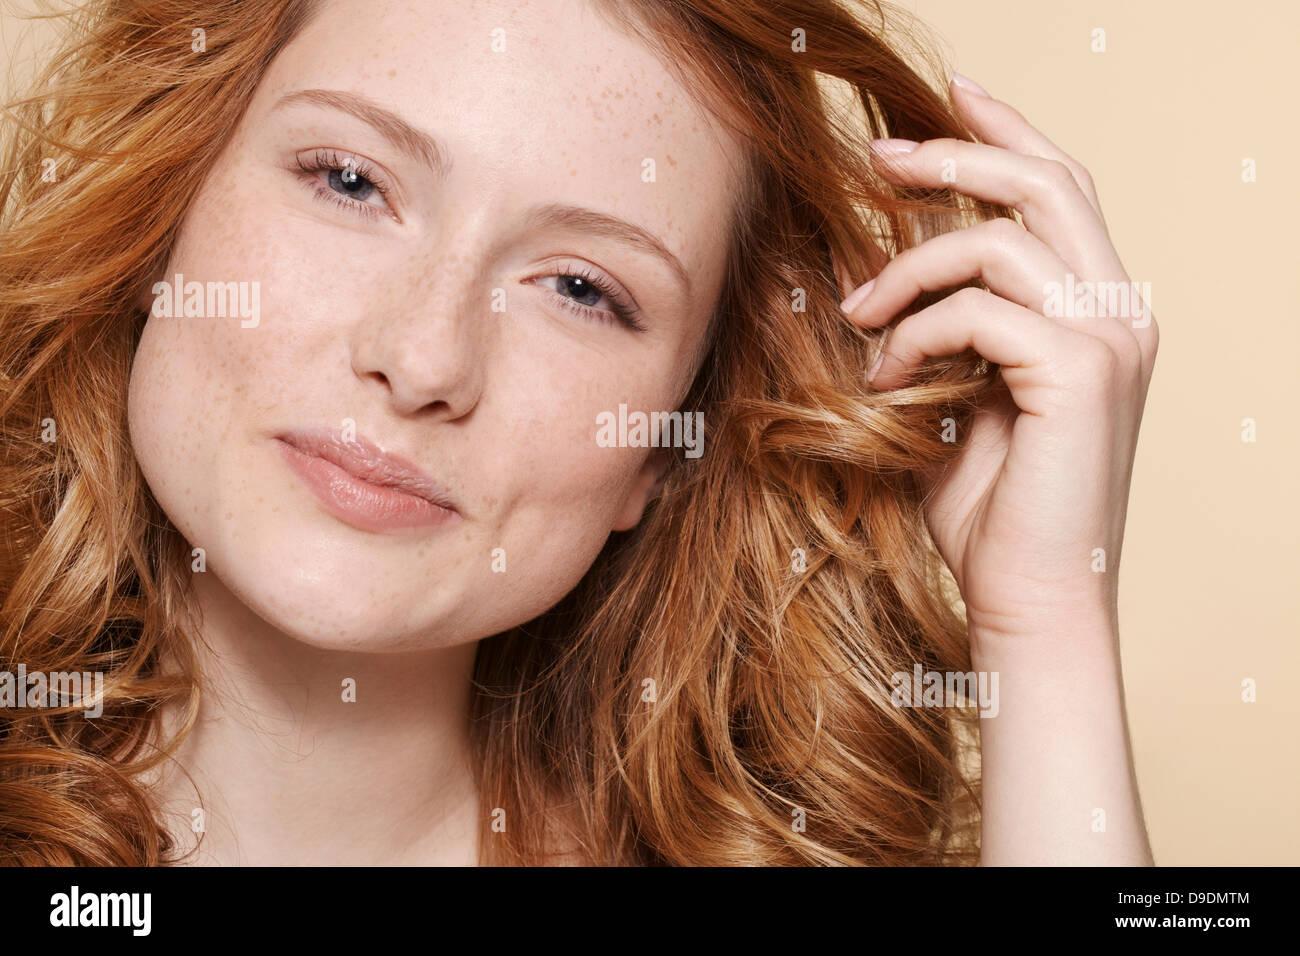 Studio shot of young woman with curly cheveux rouges, les cheveux dans la main Photo Stock